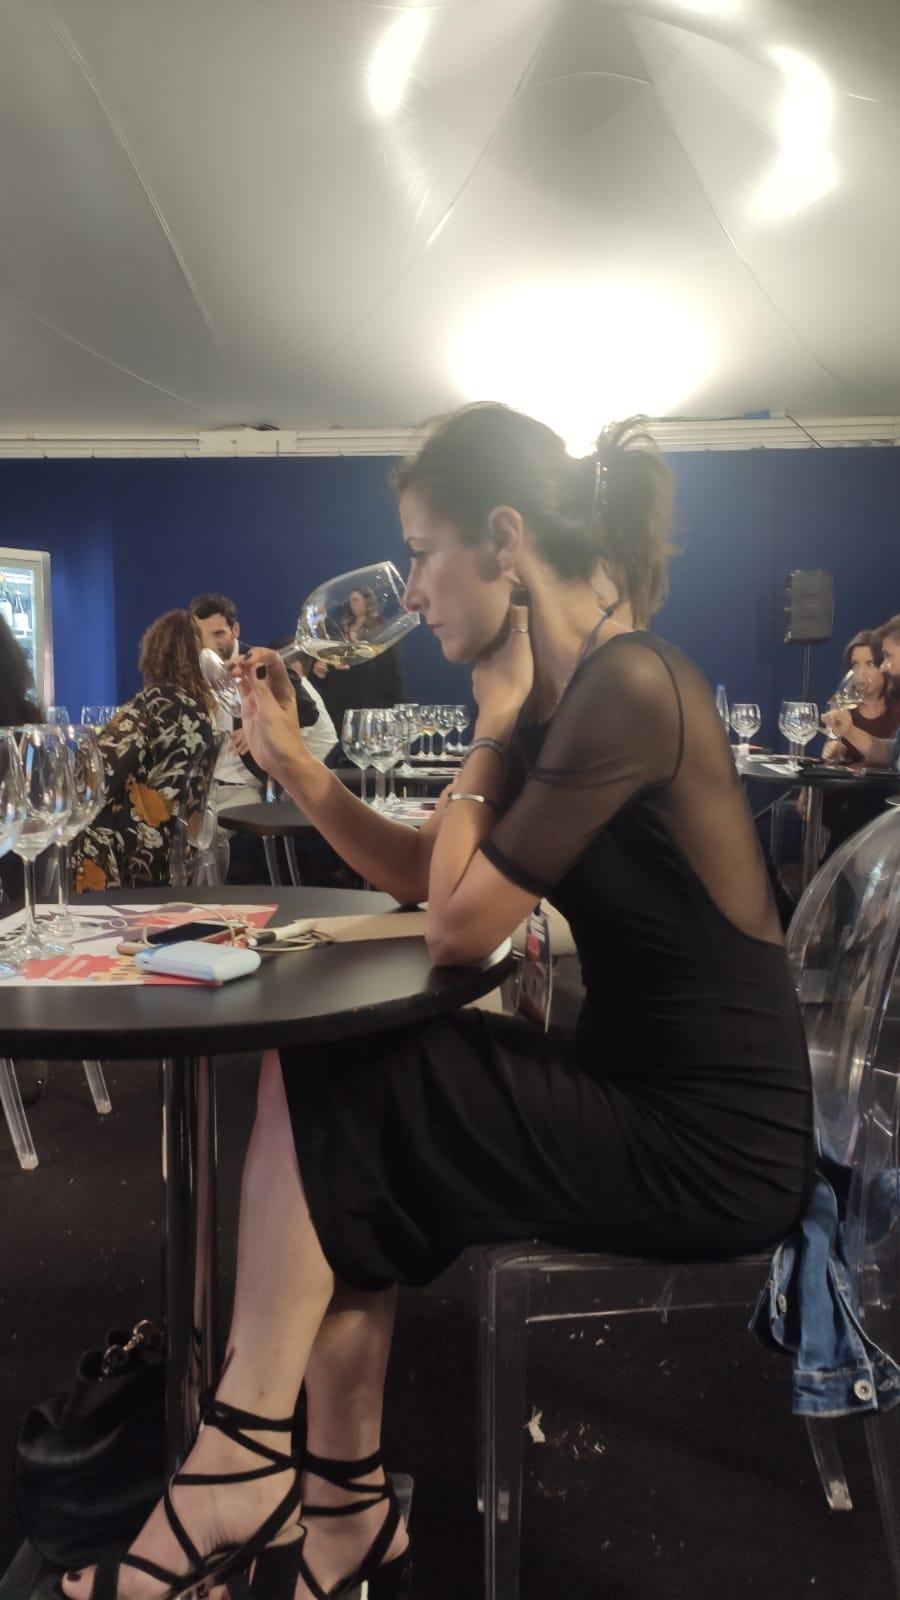 Vinoforum degustazione vini laziali